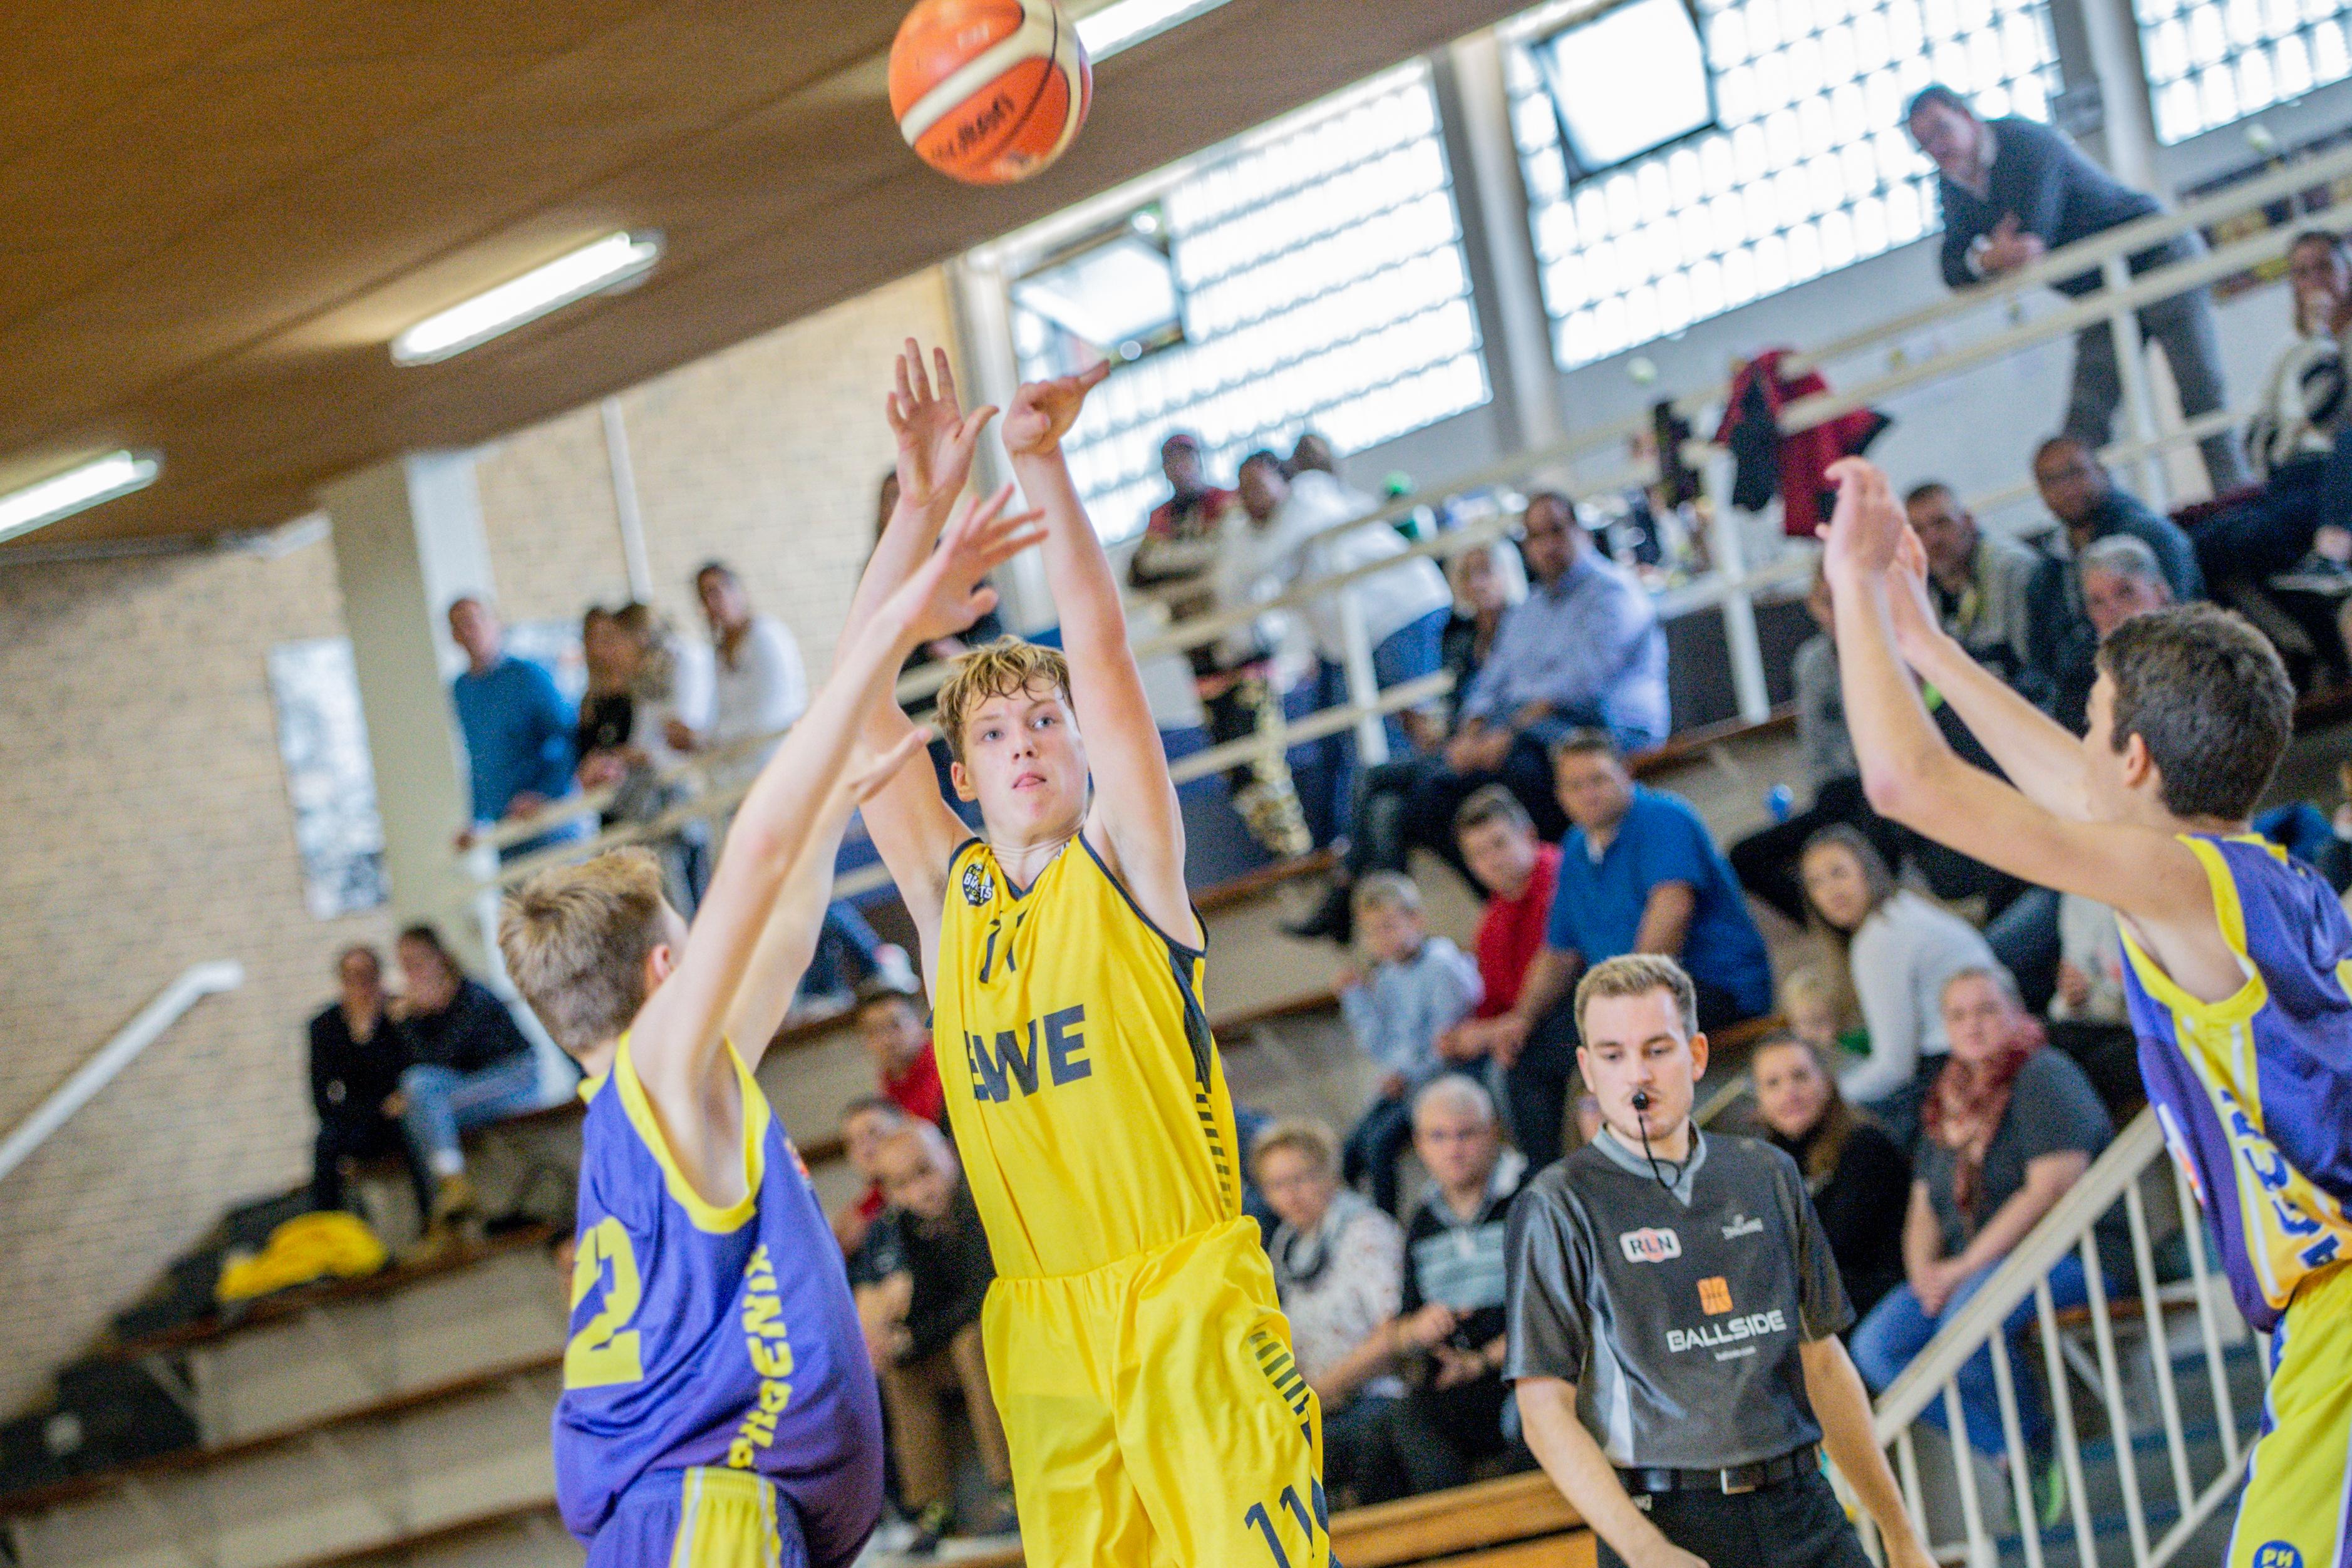 13.10.2019, Oldenburg, Sporthalle Haarenufer: JBBL | EWE Baskets Juniors - Phoenix Hagen Youngsters  //  Luka ZAJIC (#2 Phoenix Hagen Youngsters/JBBL), Lasse PICKERT (#11 EWE Baskets Juniors/JBBL)  || Foto: Erik Hillmer